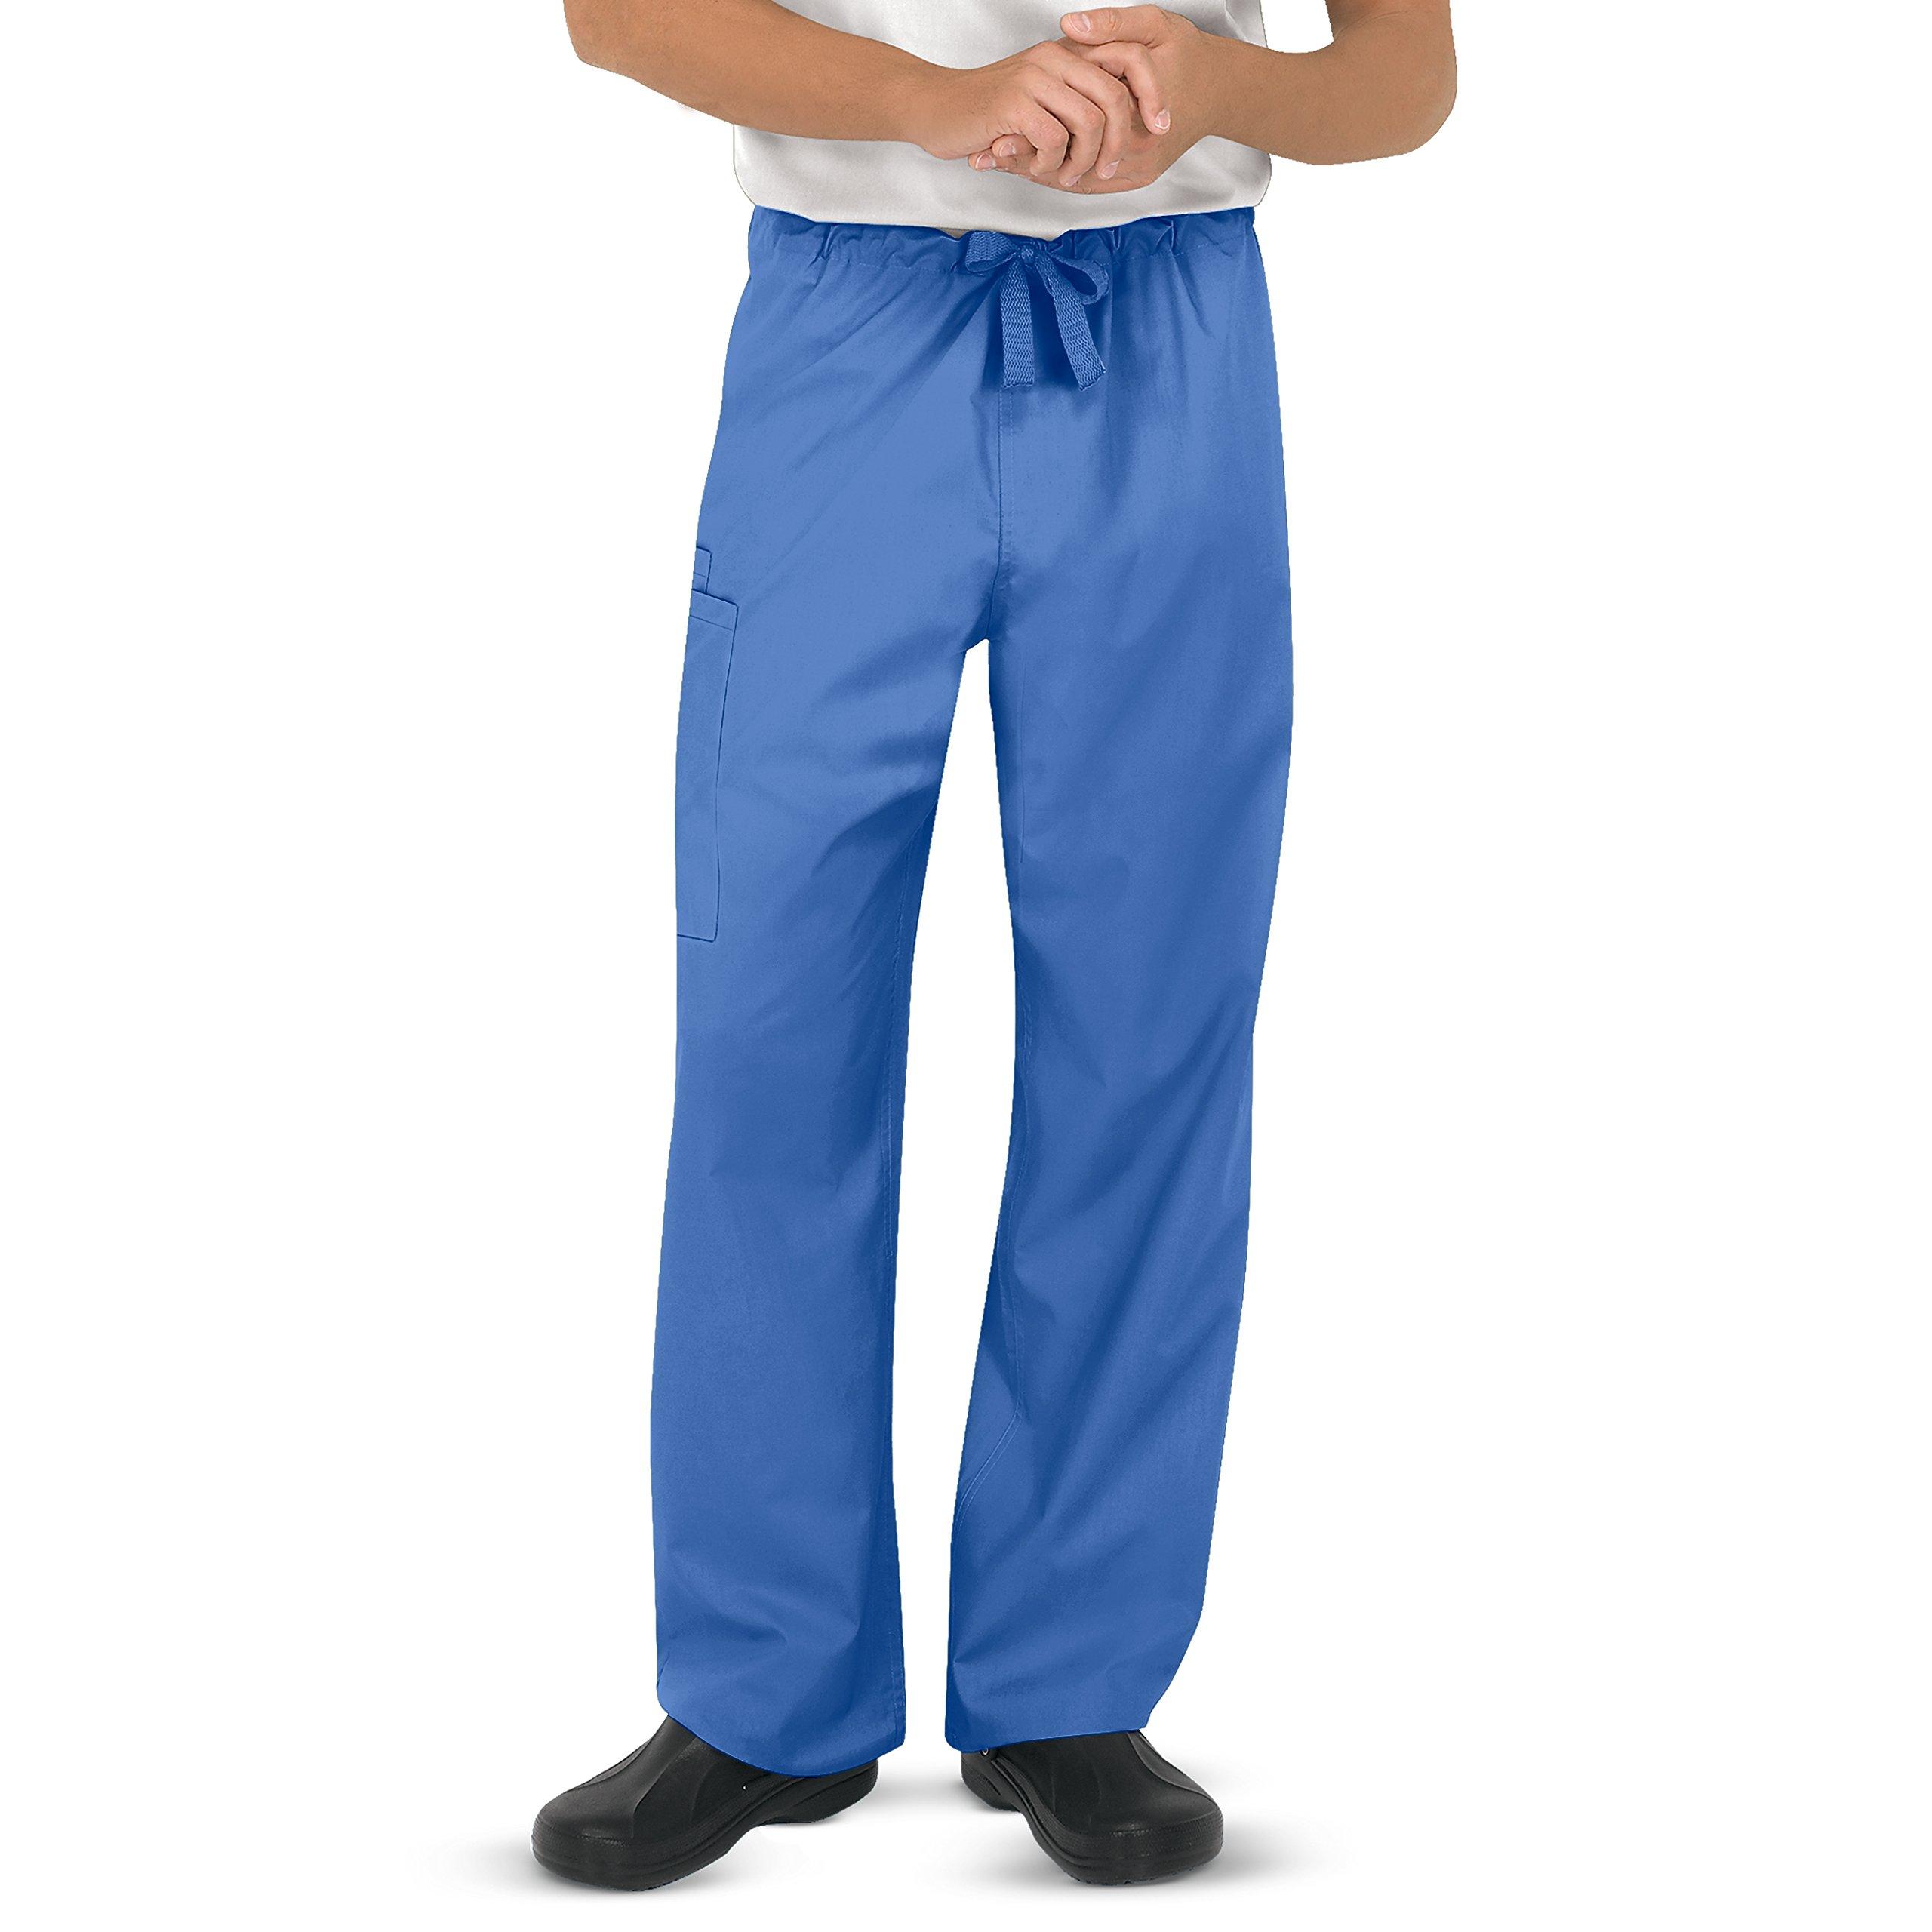 Strictly Scrubs Unisex Medical Uniform Set (Medium, Ceil) by Strictly Scrubs (Image #8)